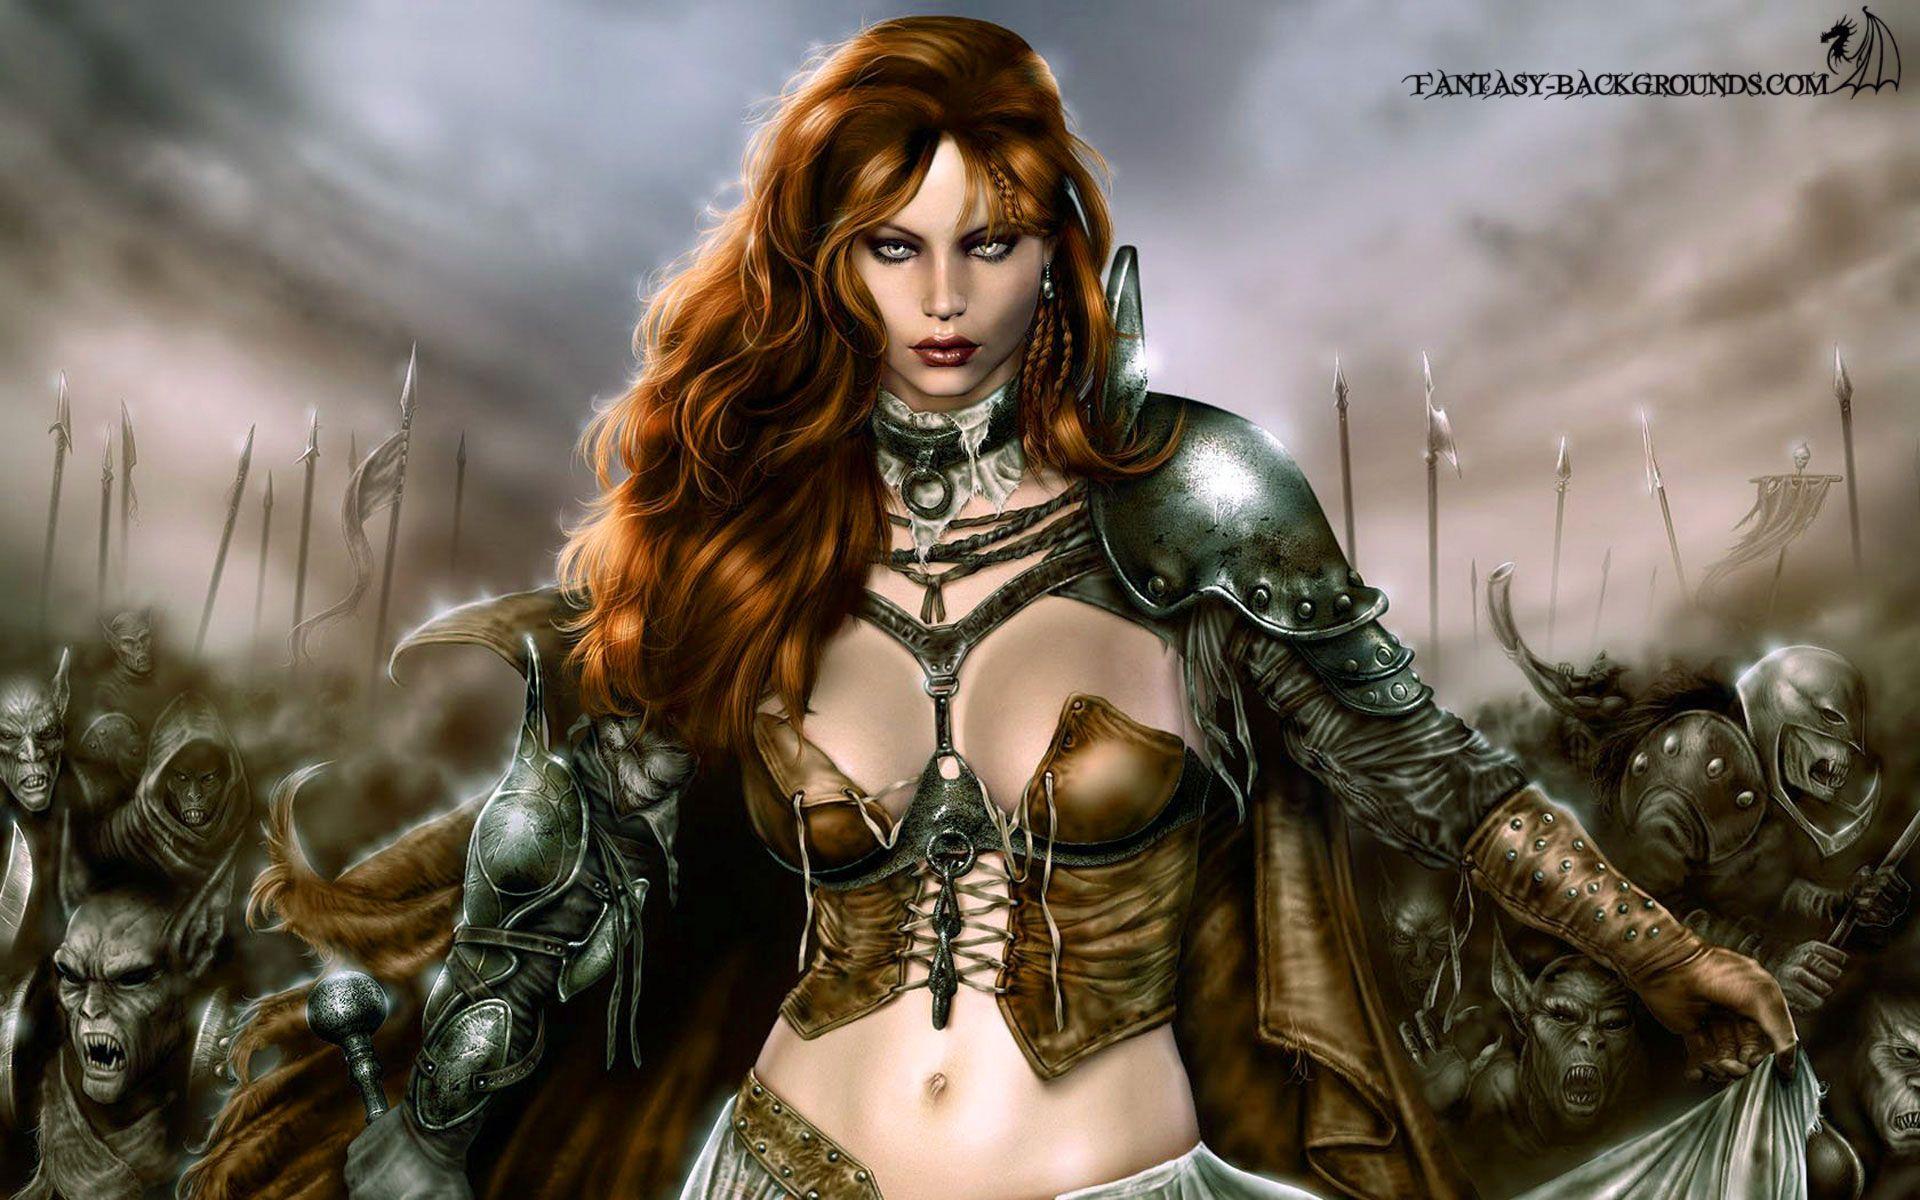 warrior women - Google Search | Artwork | Pinterest | Great women ...